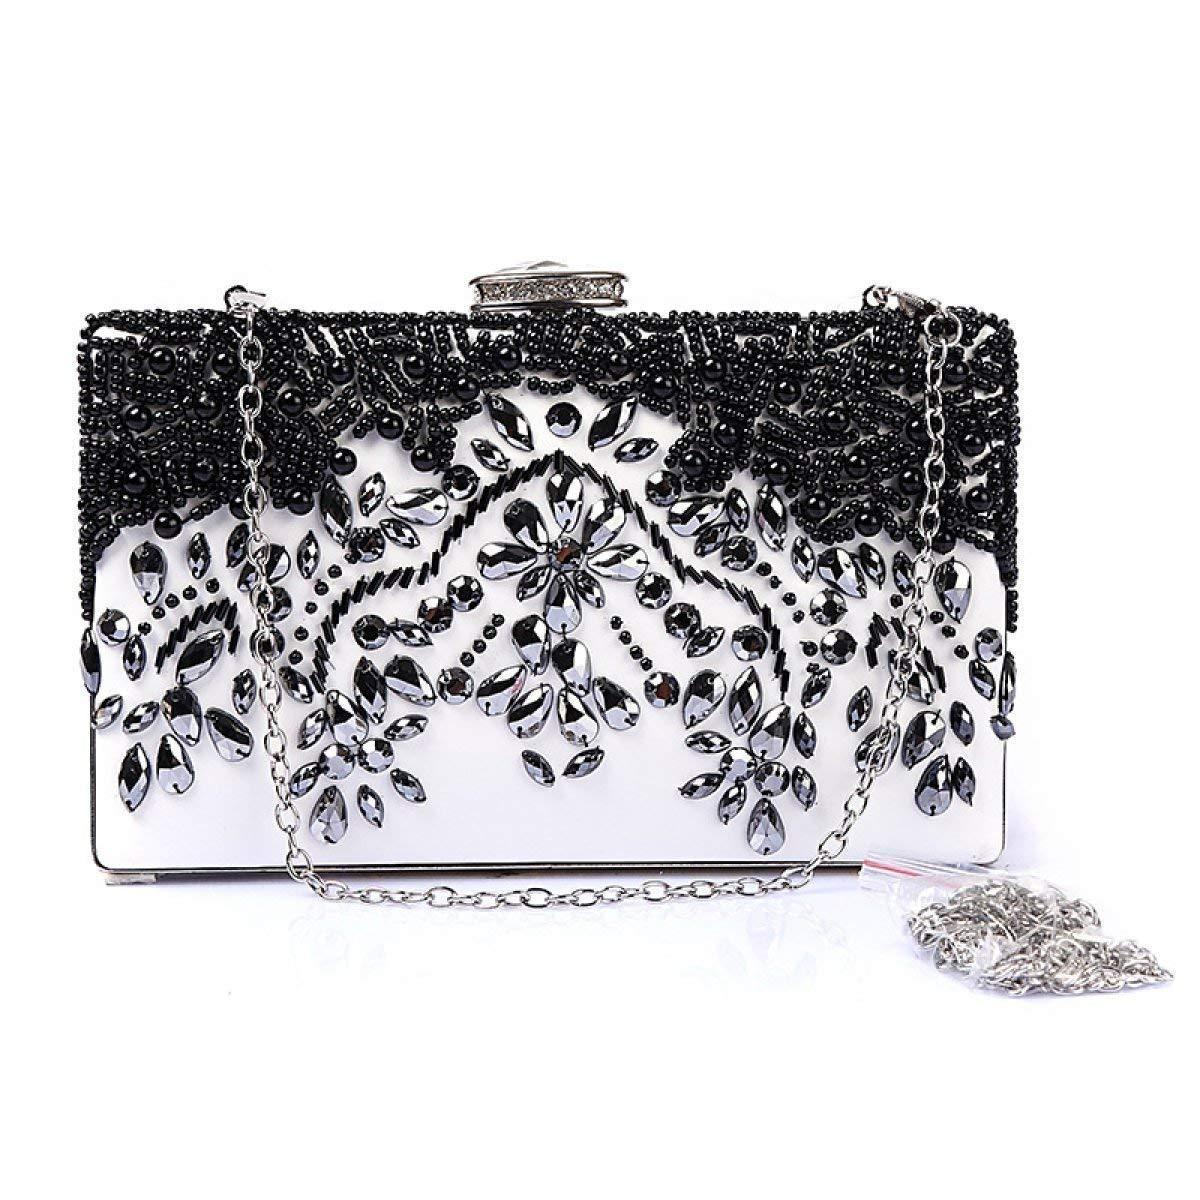 RMXMY Womens Crystal Dinner Clutch Bag Wedding Wallet Luxury Temperament Party Prom Bag Party Bag